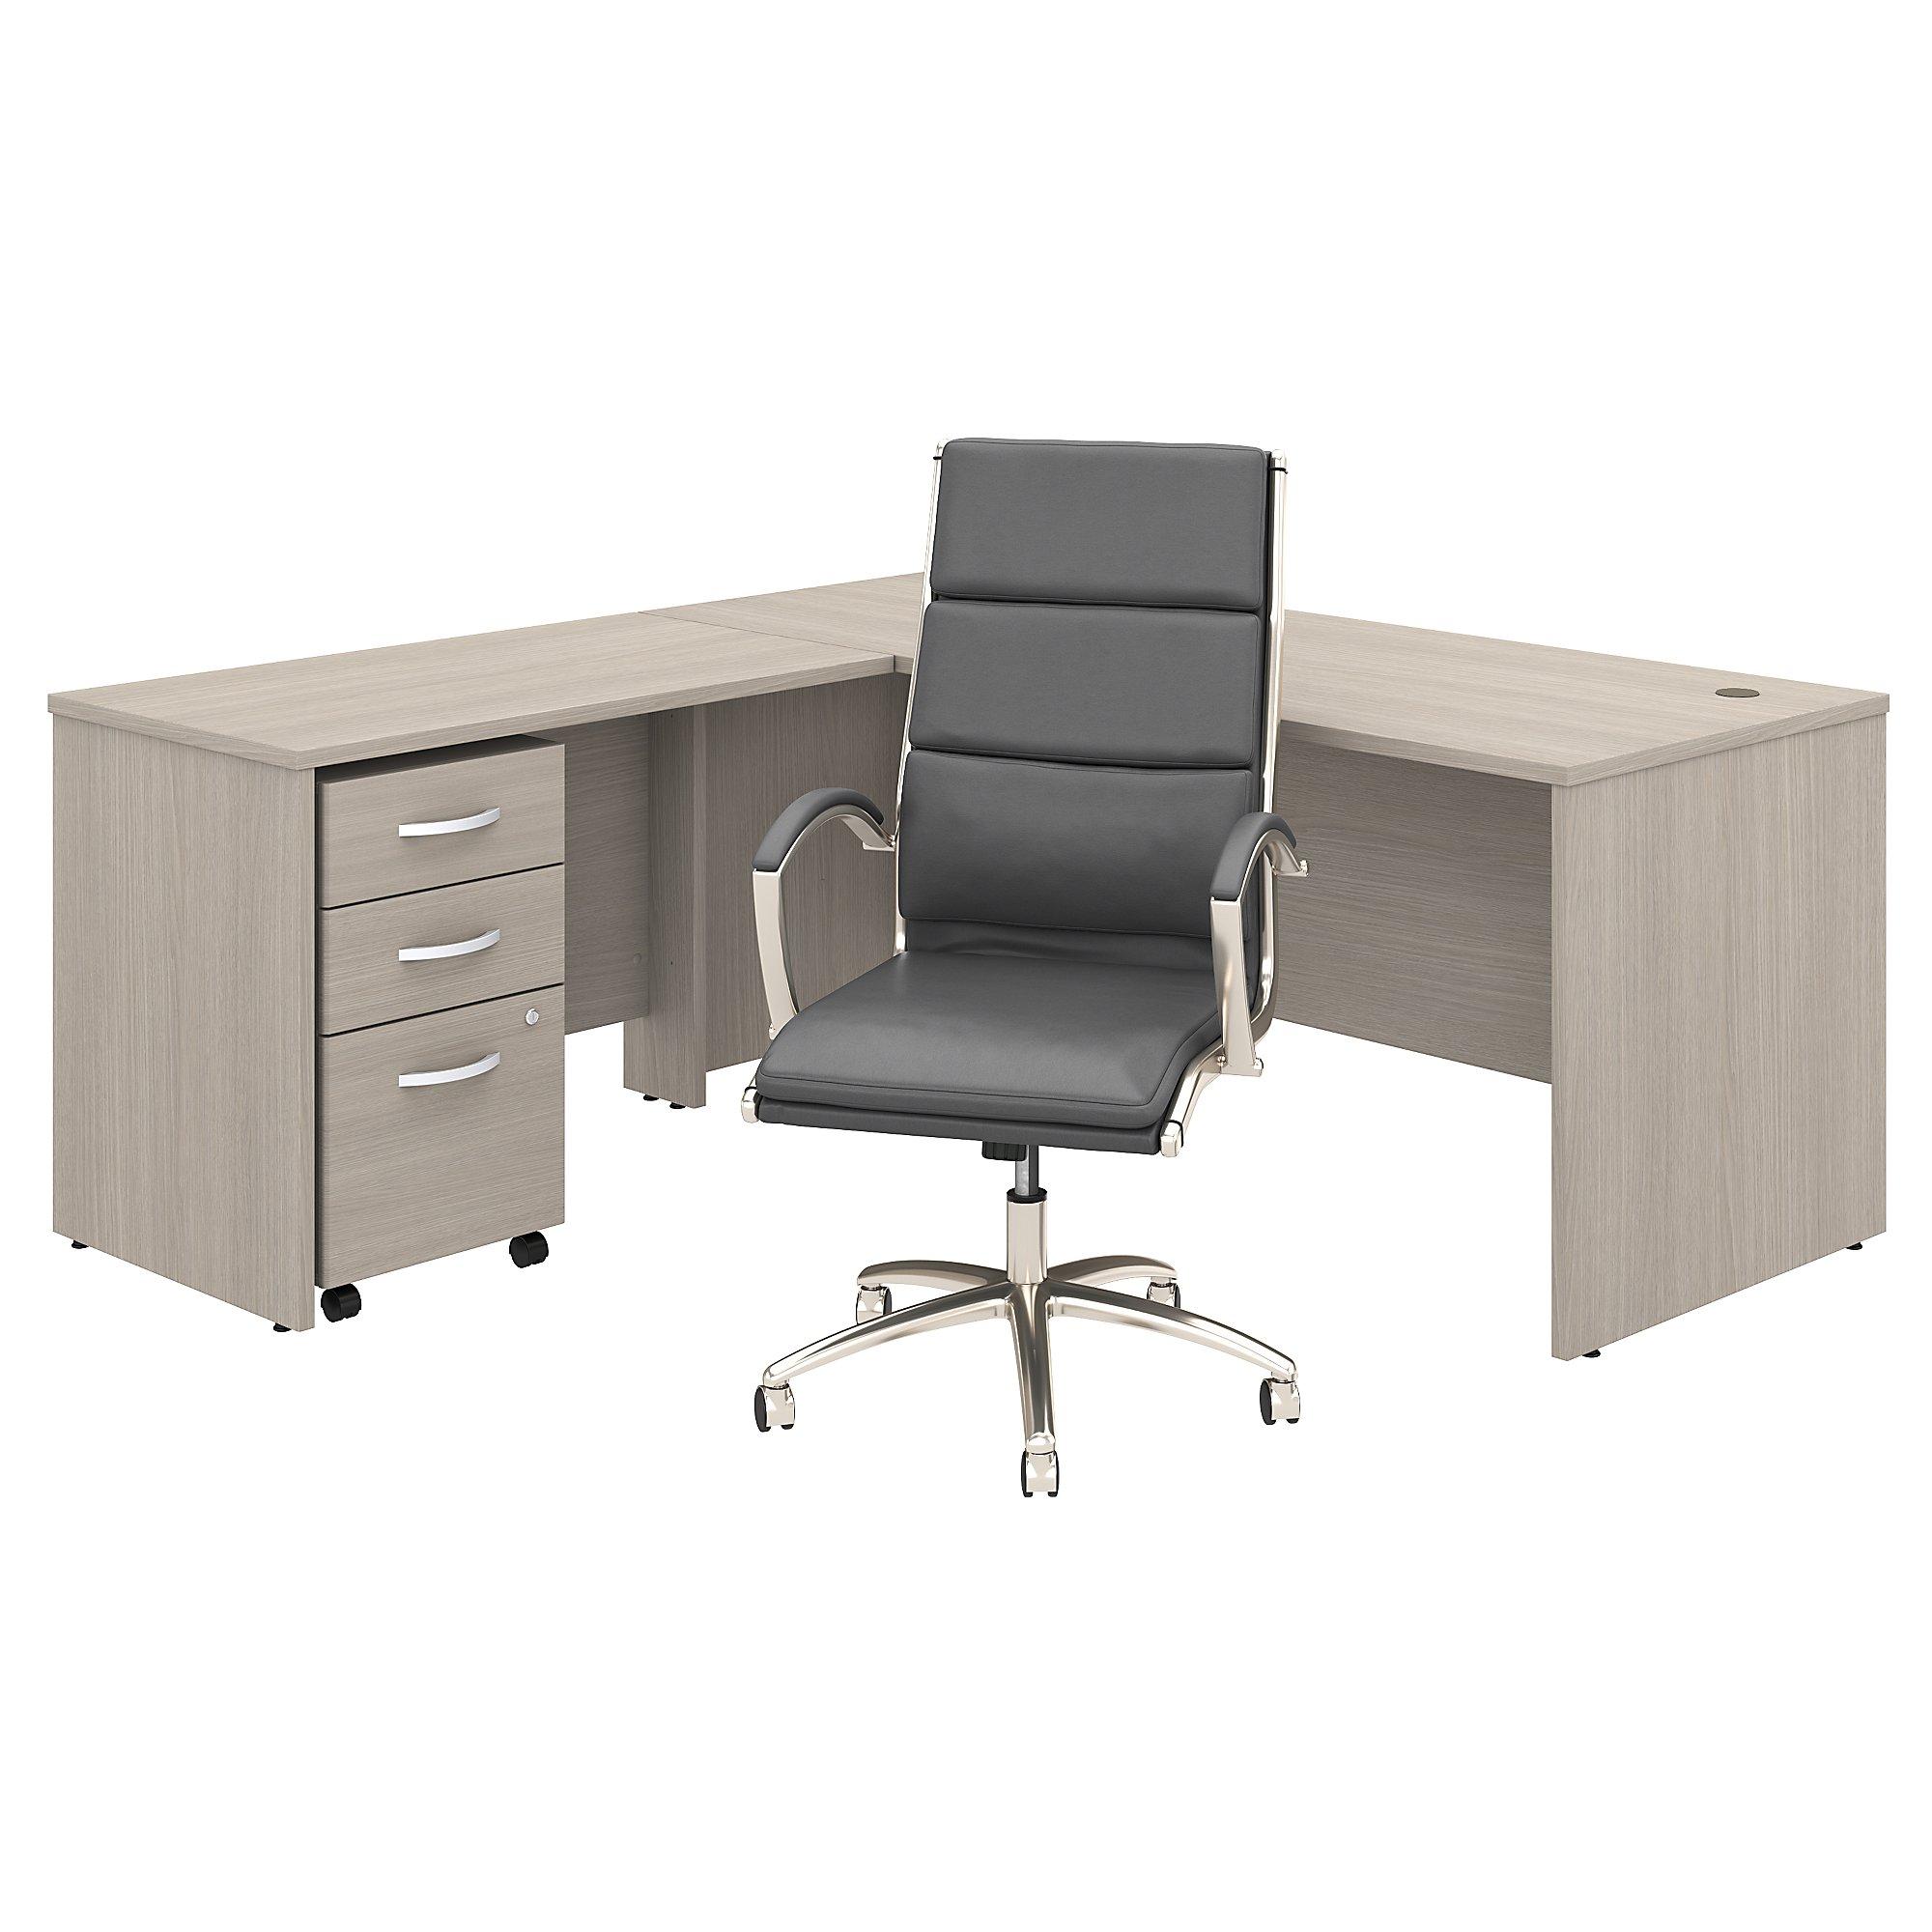 studio c l desk with chair in sand oak